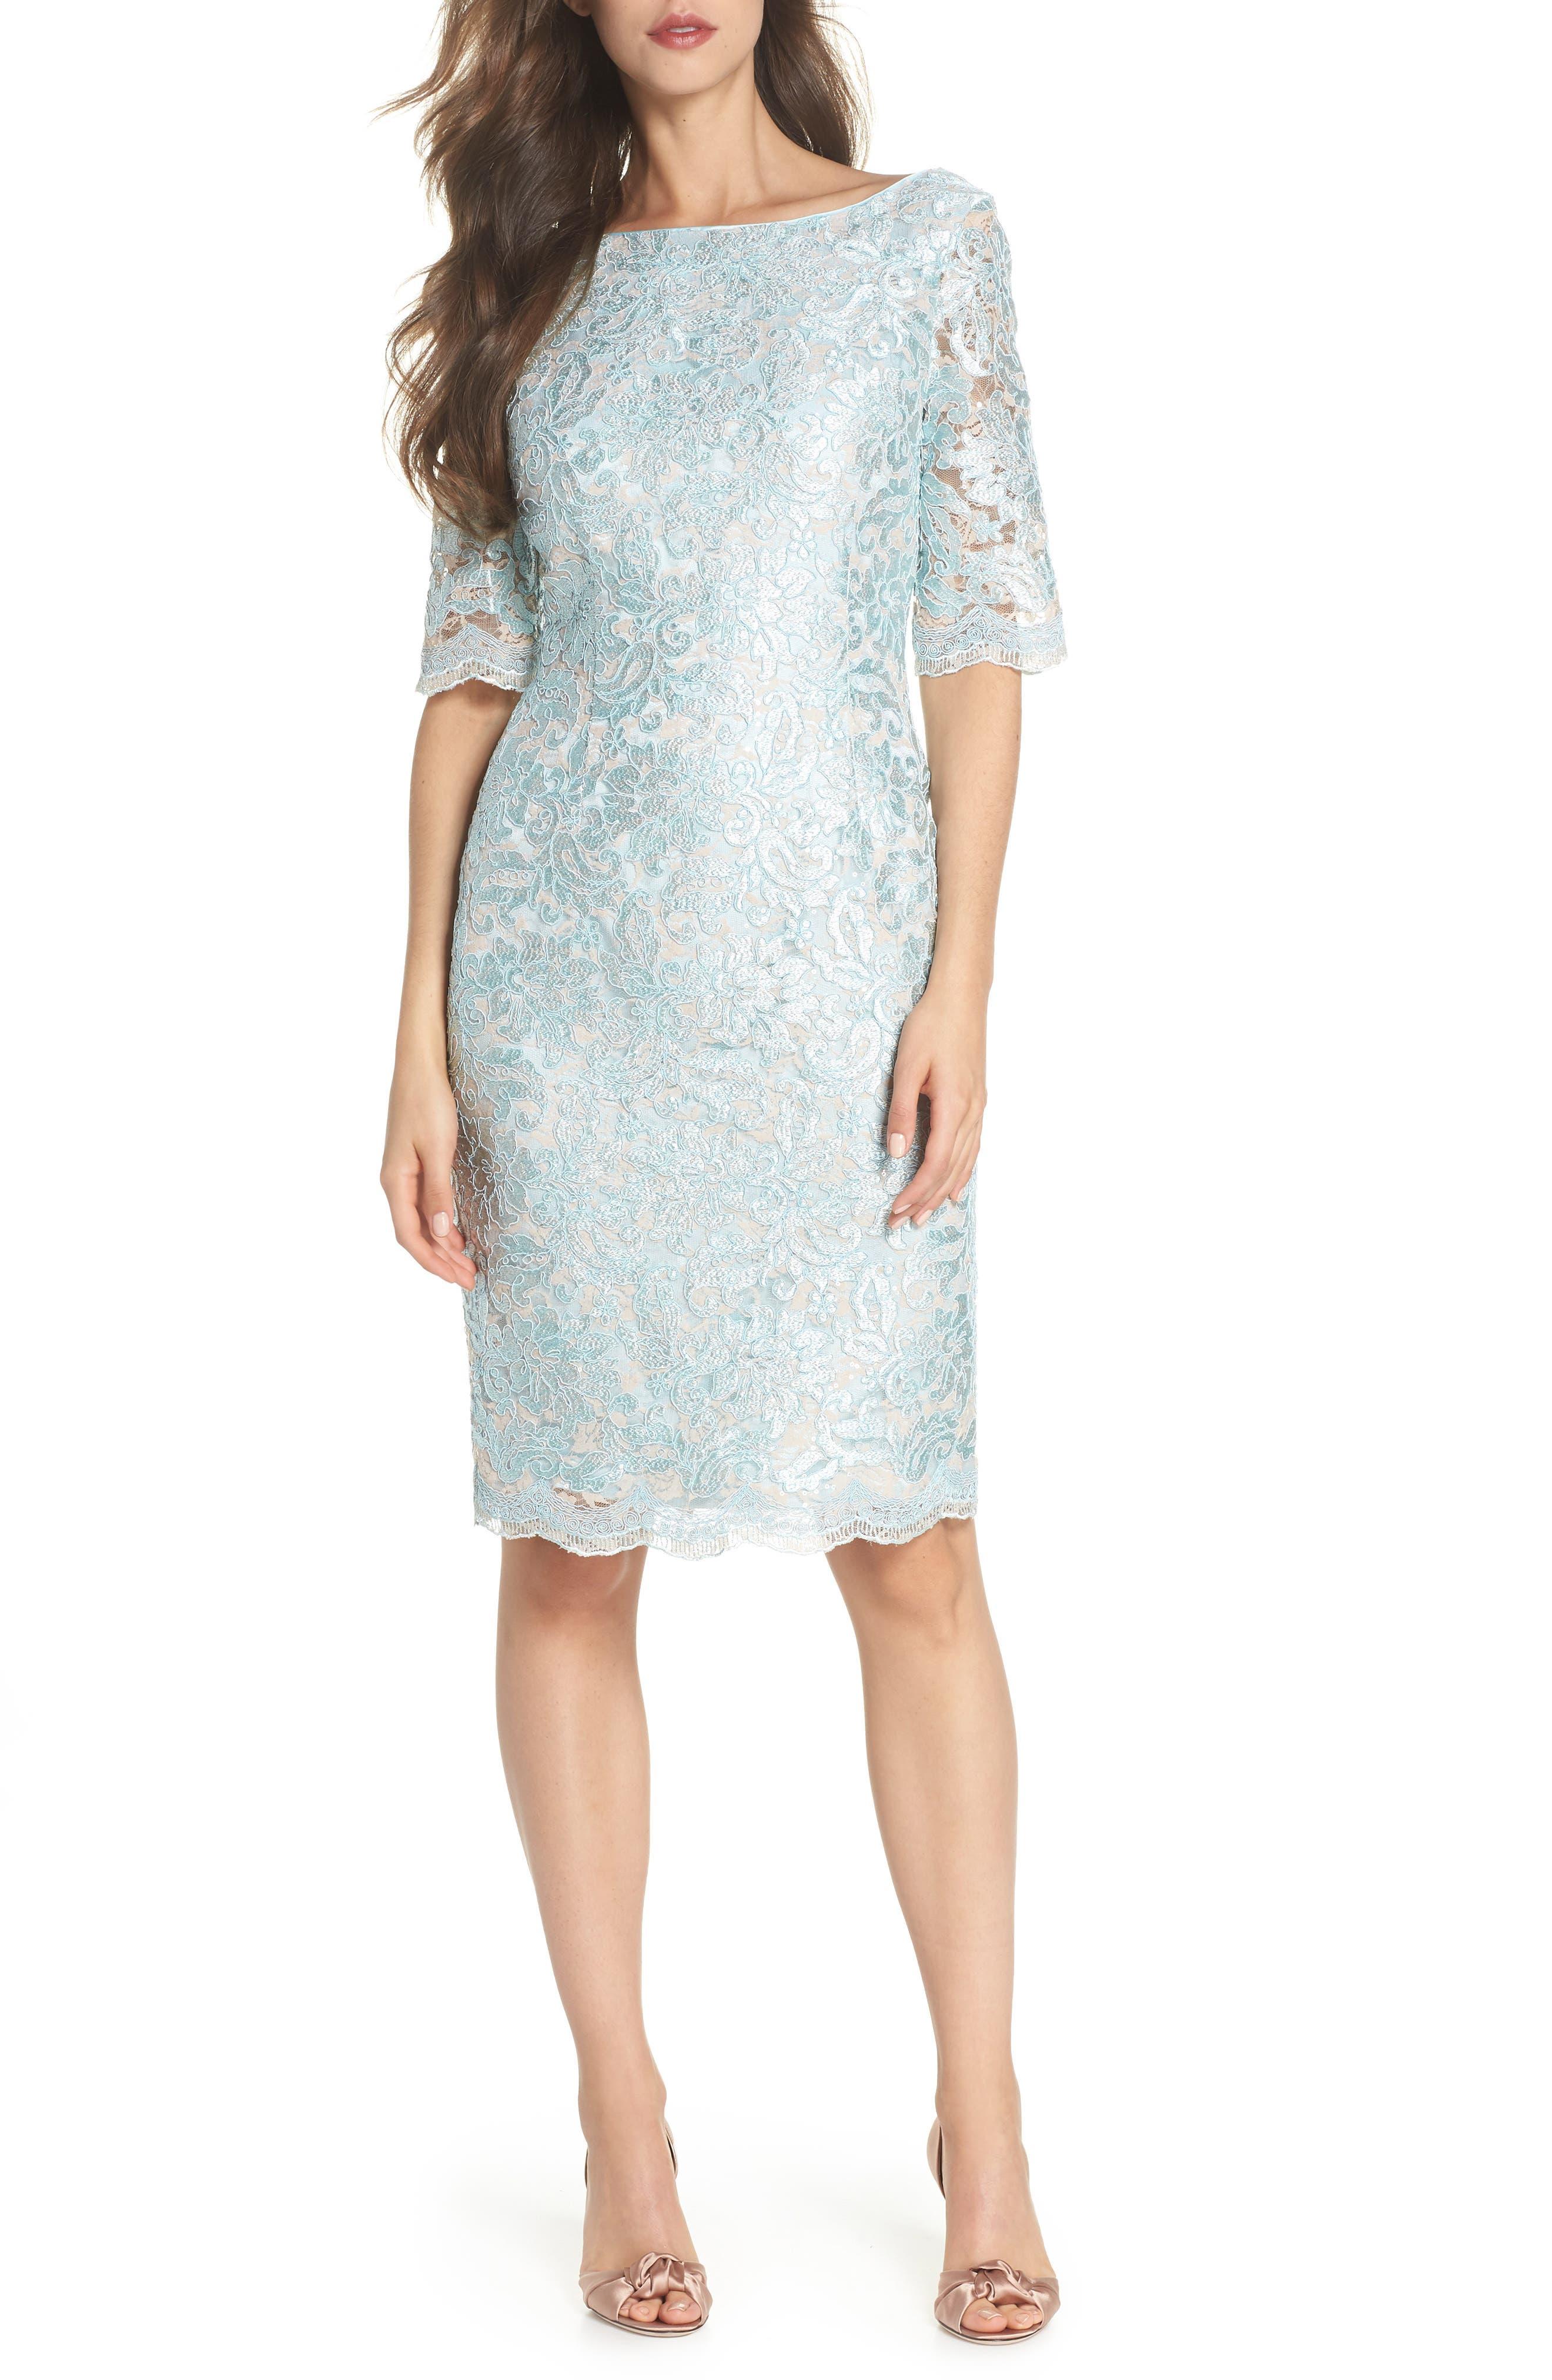 ELIZA J Lace Sheath Dress, Main, color, 330